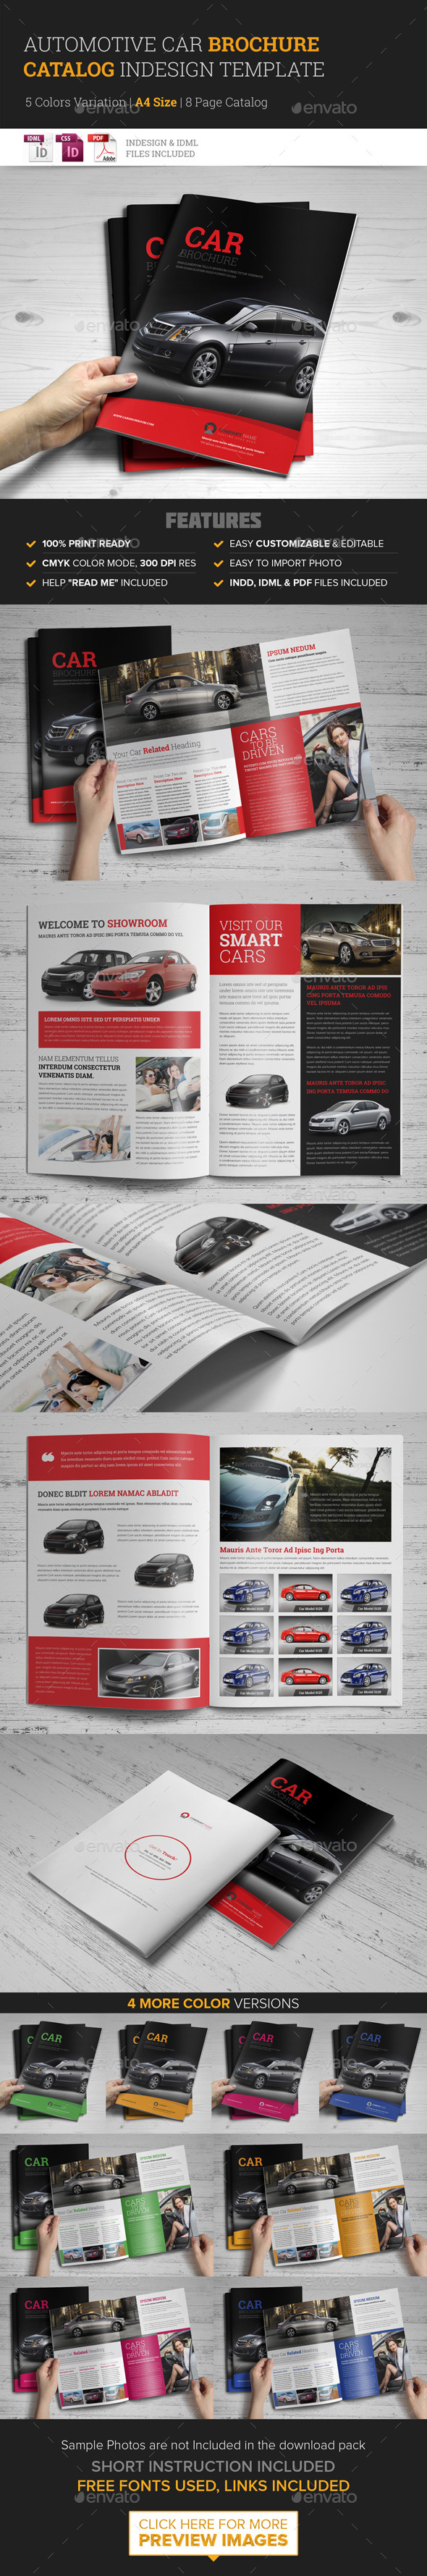 Automotive Car Brochure Catalog InDesign Template - Catalogs Brochures